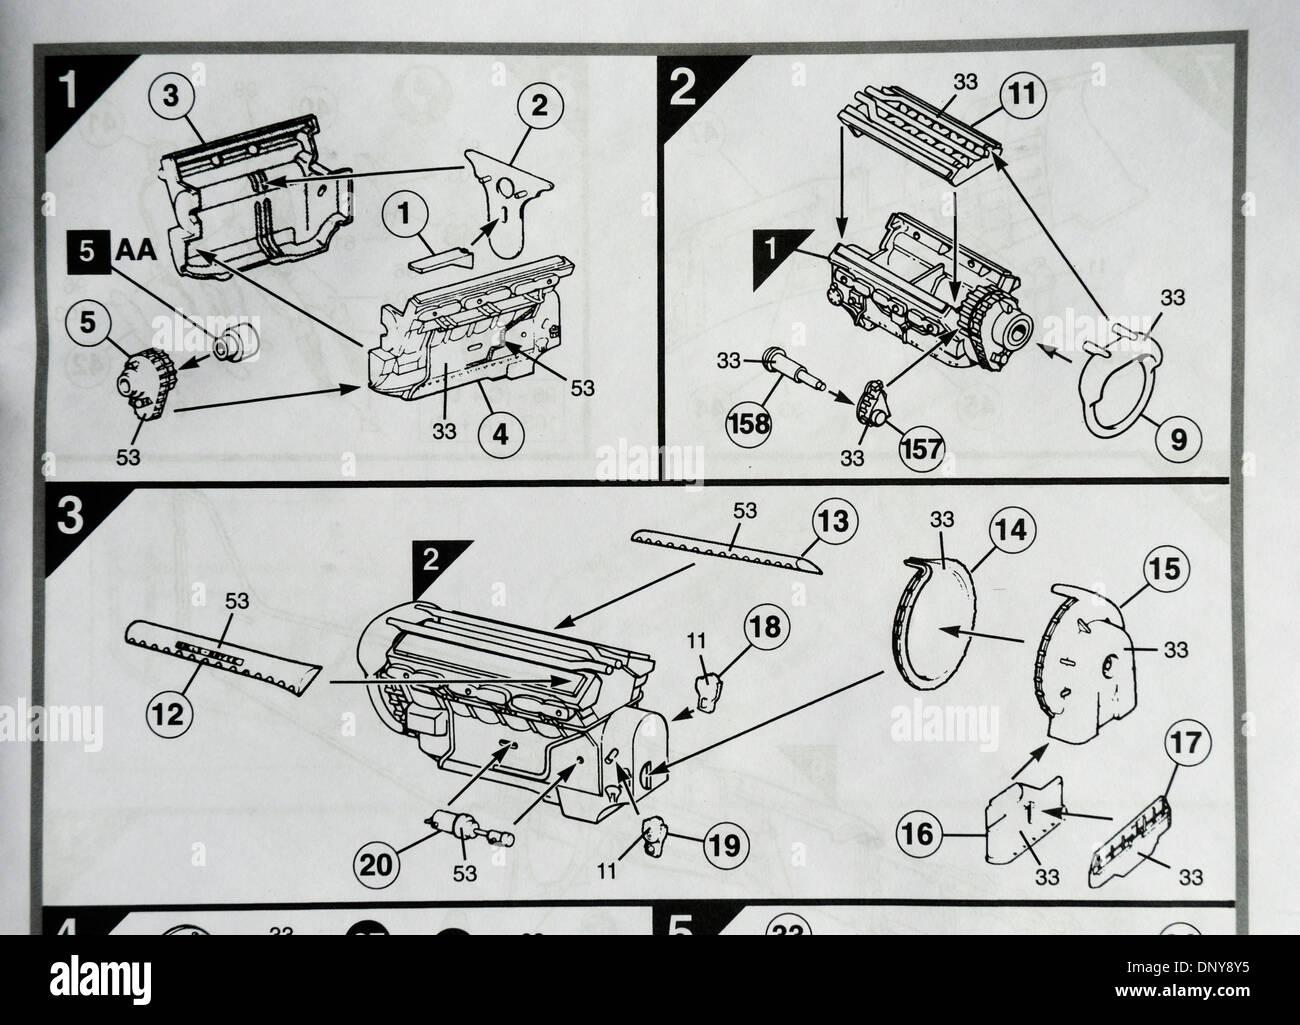 Airfix kit assembly instructions - Stock Image